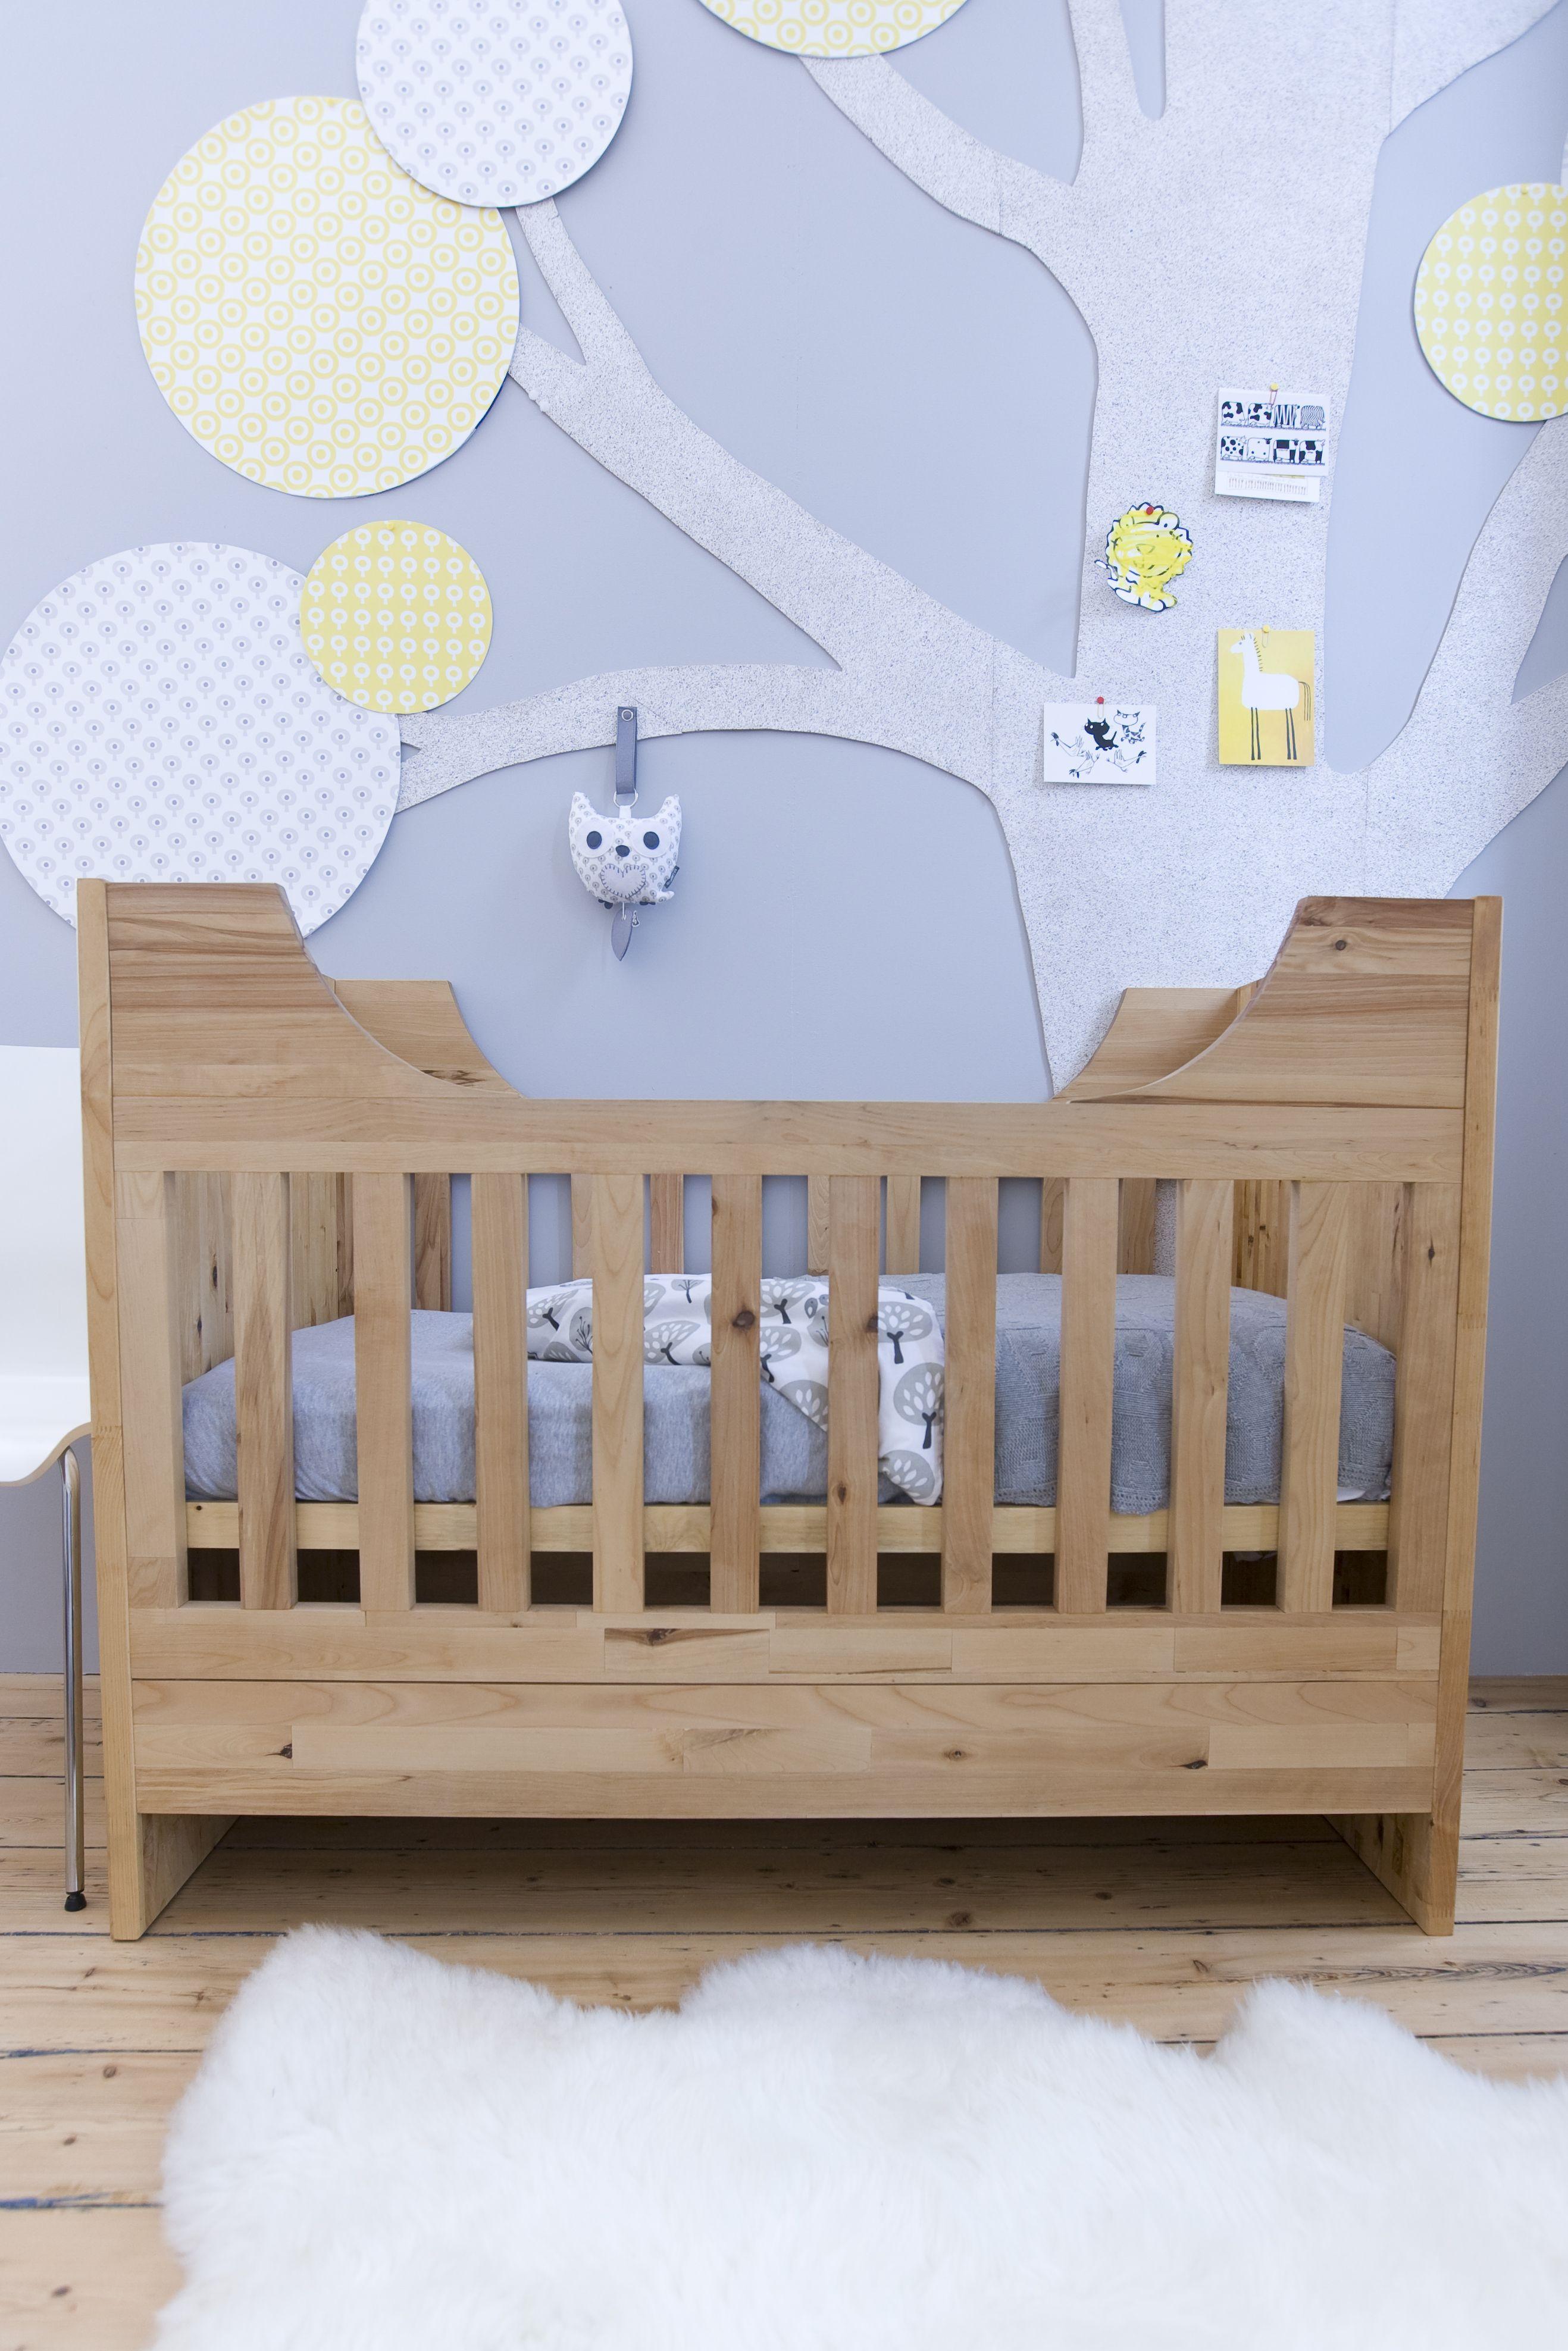 kidsroom | TiS Lifestyle. I'm liking this tree wall art